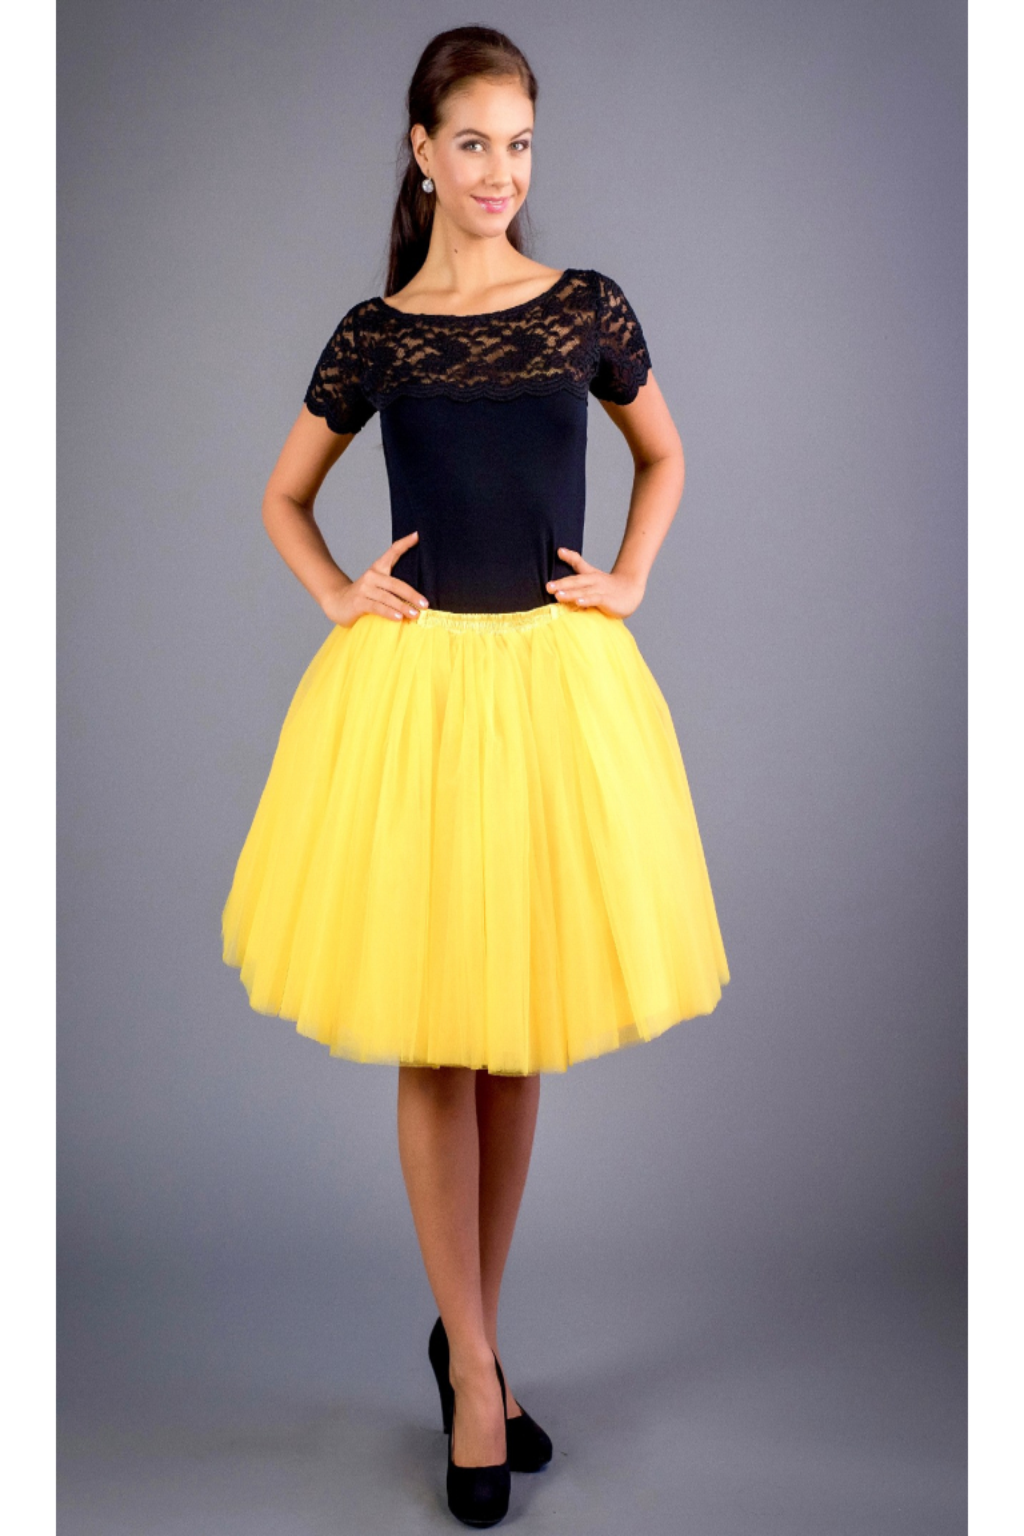 horcicova tutu sukne